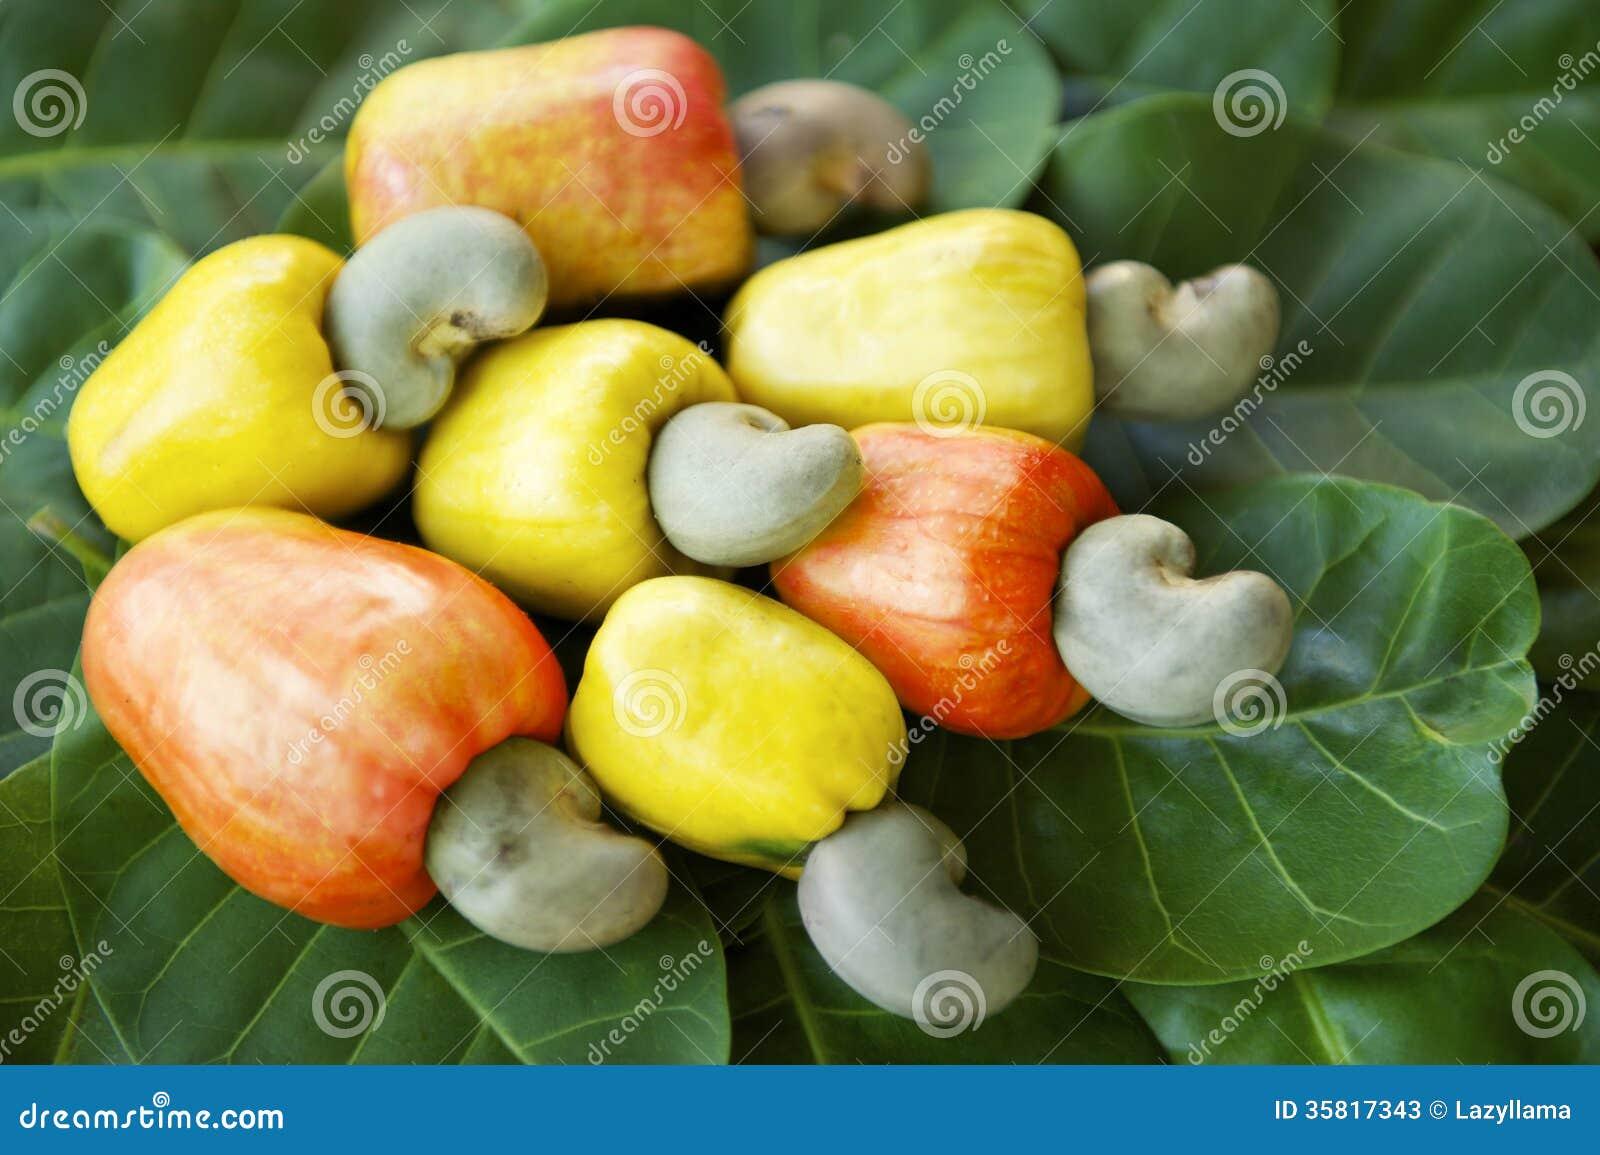 Image Result For Fruit Farm P Ography